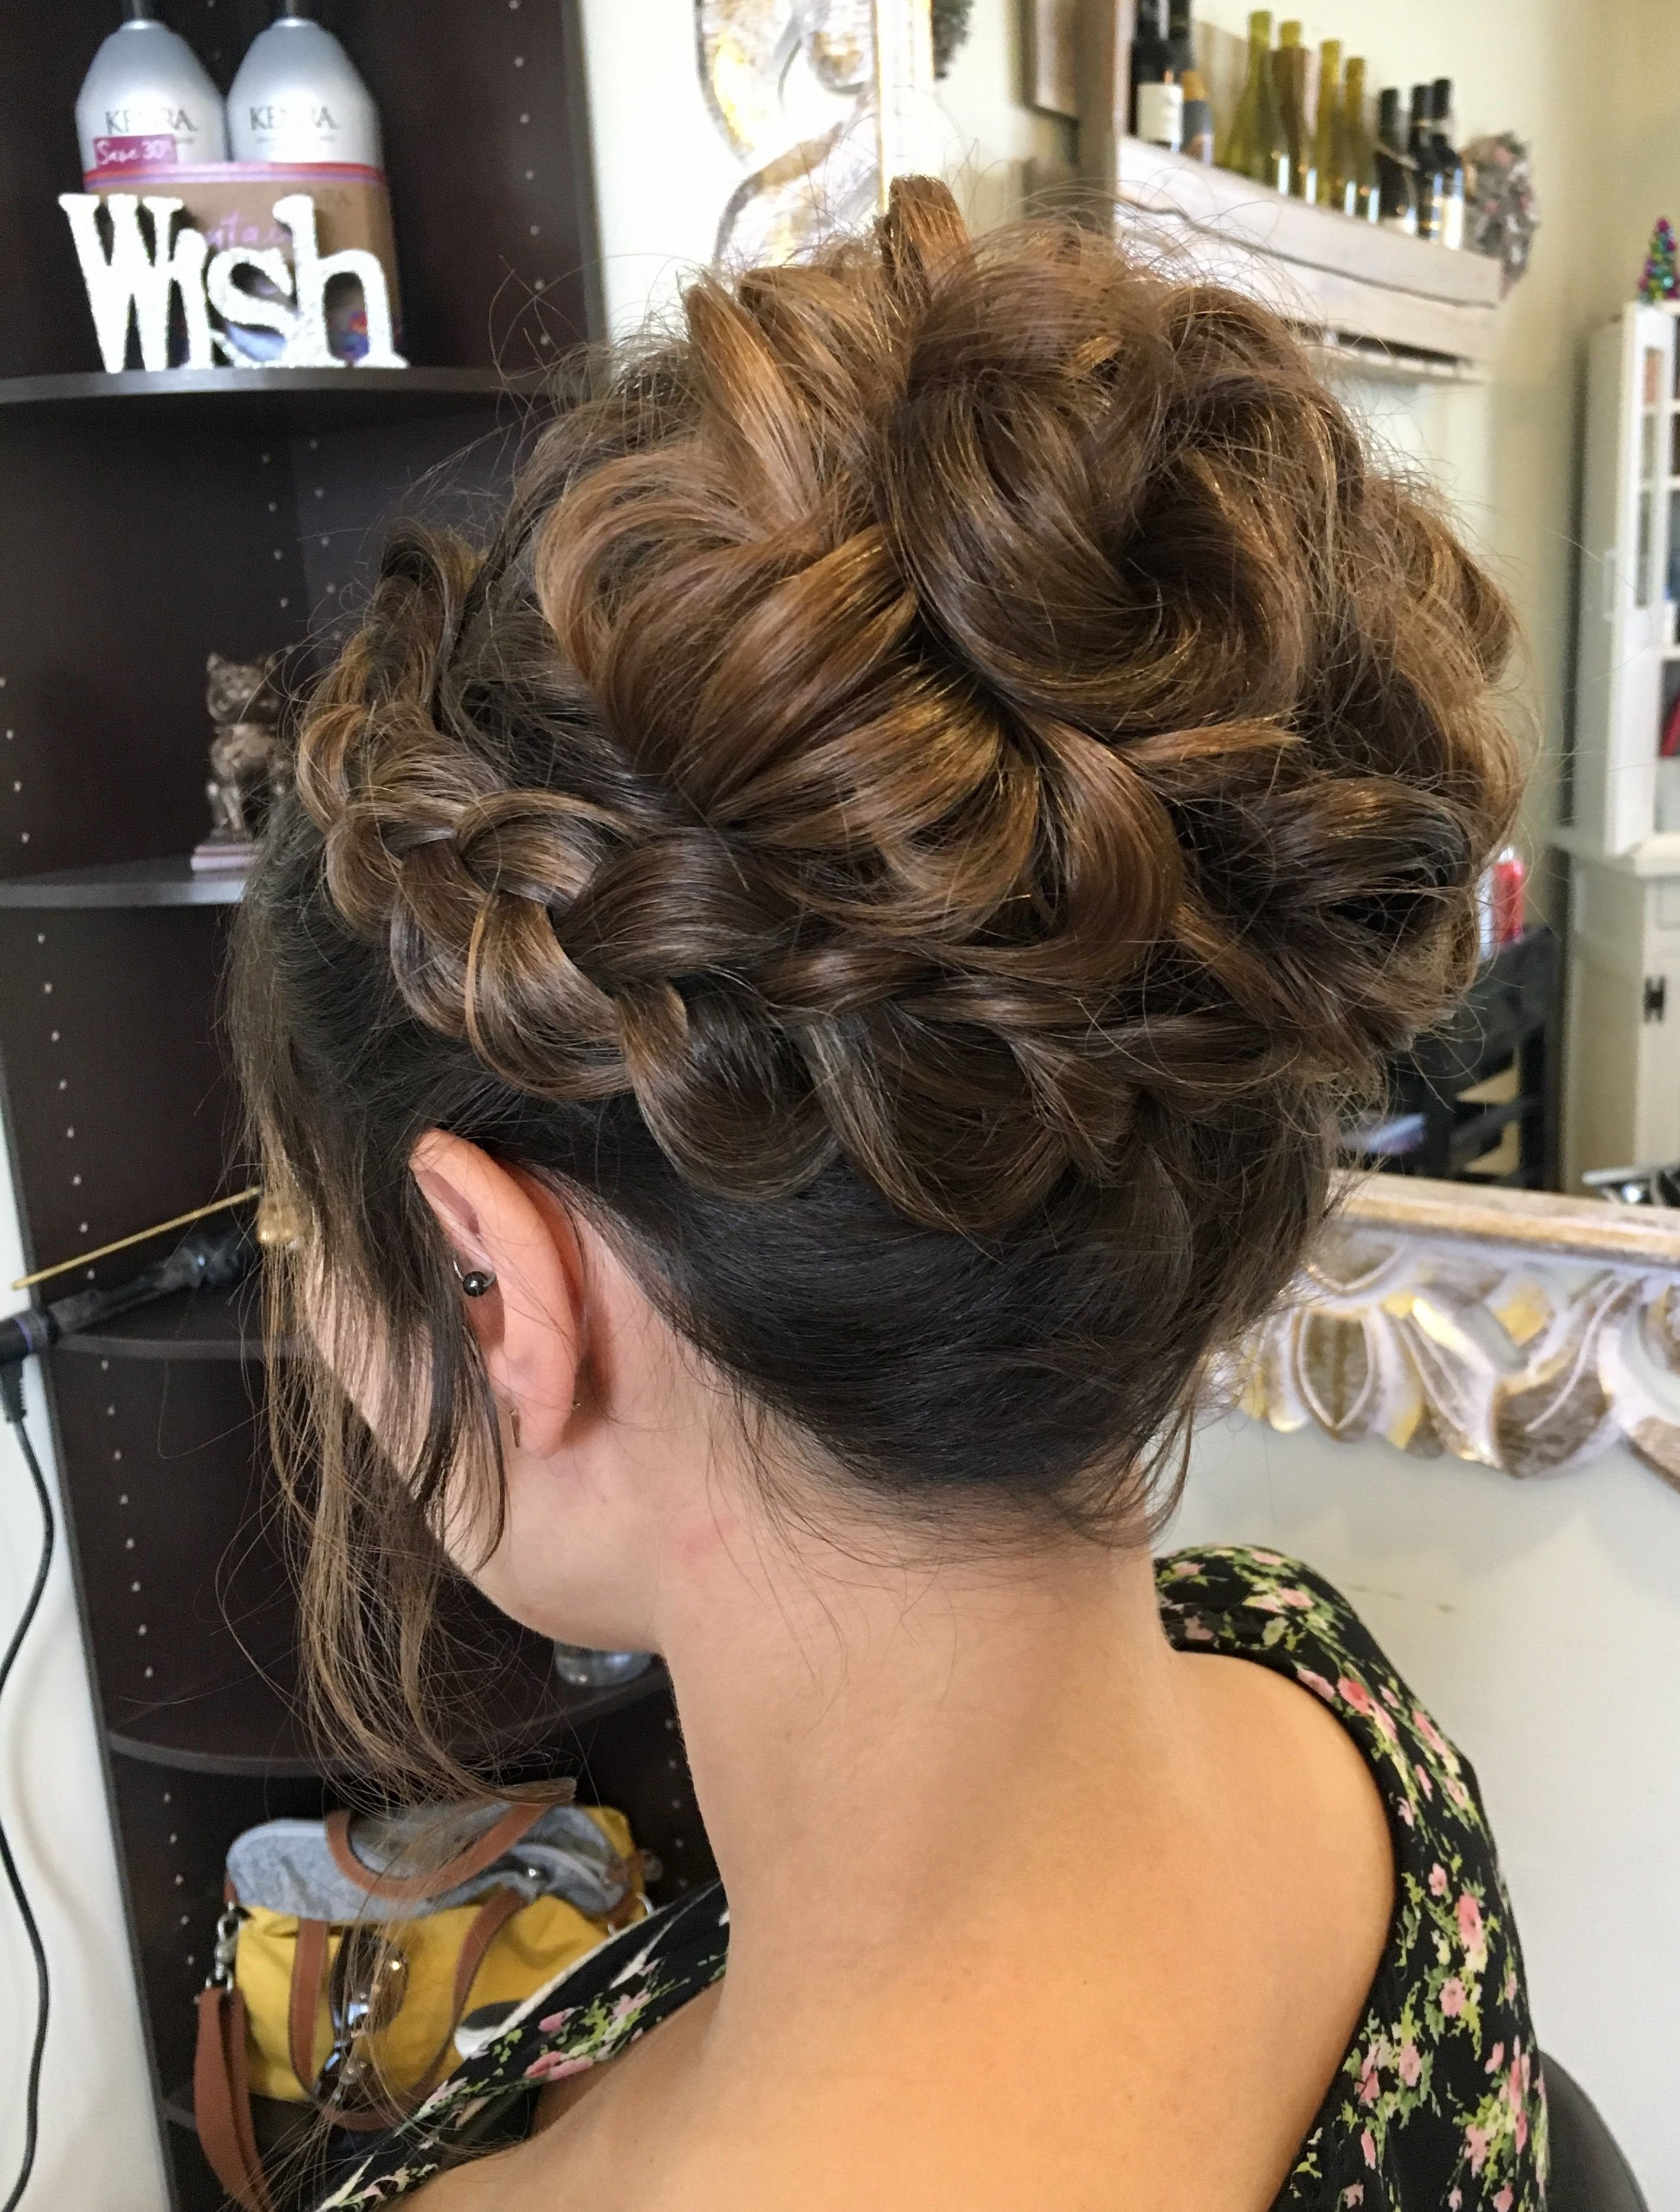 56 Best Ideas For Hairstyles For Medium Length Hair Tutorial Updo Bridesmaid Hair Styles Long Hair Styles Medium Hair Styles